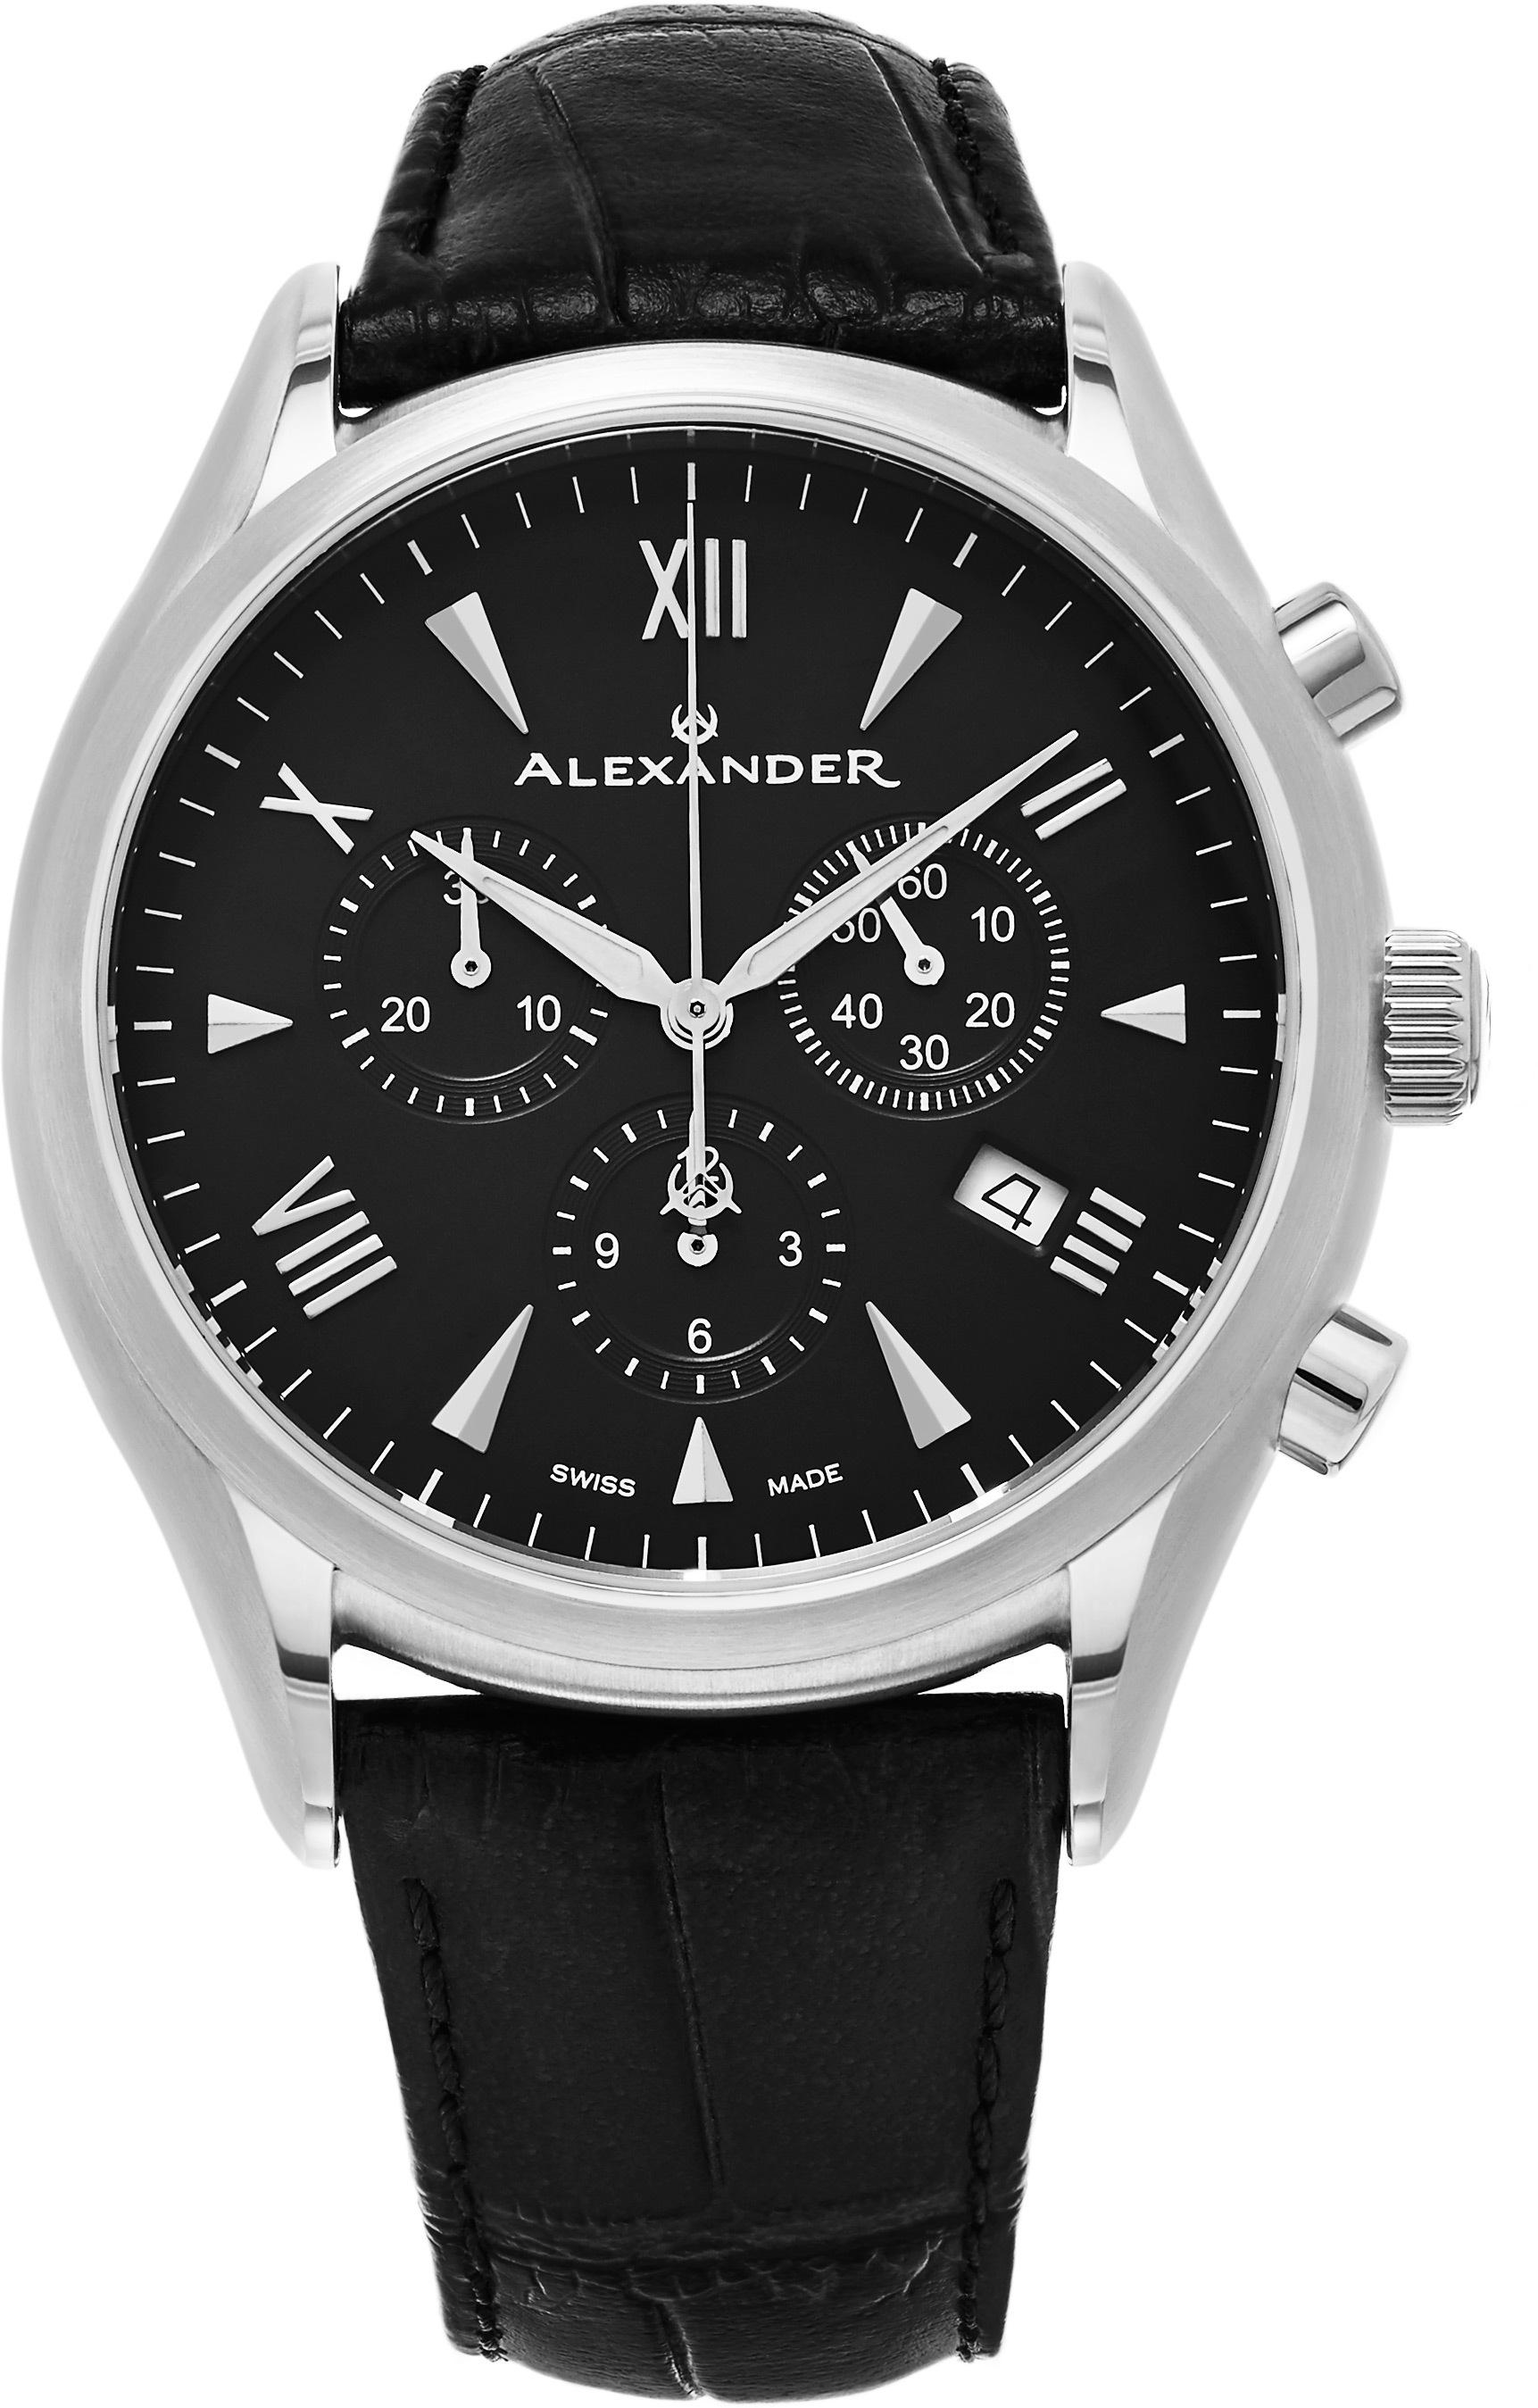 Alexander Heroic Herrklocka A021-01 Svart/Läder Ø42 mm - Alexander